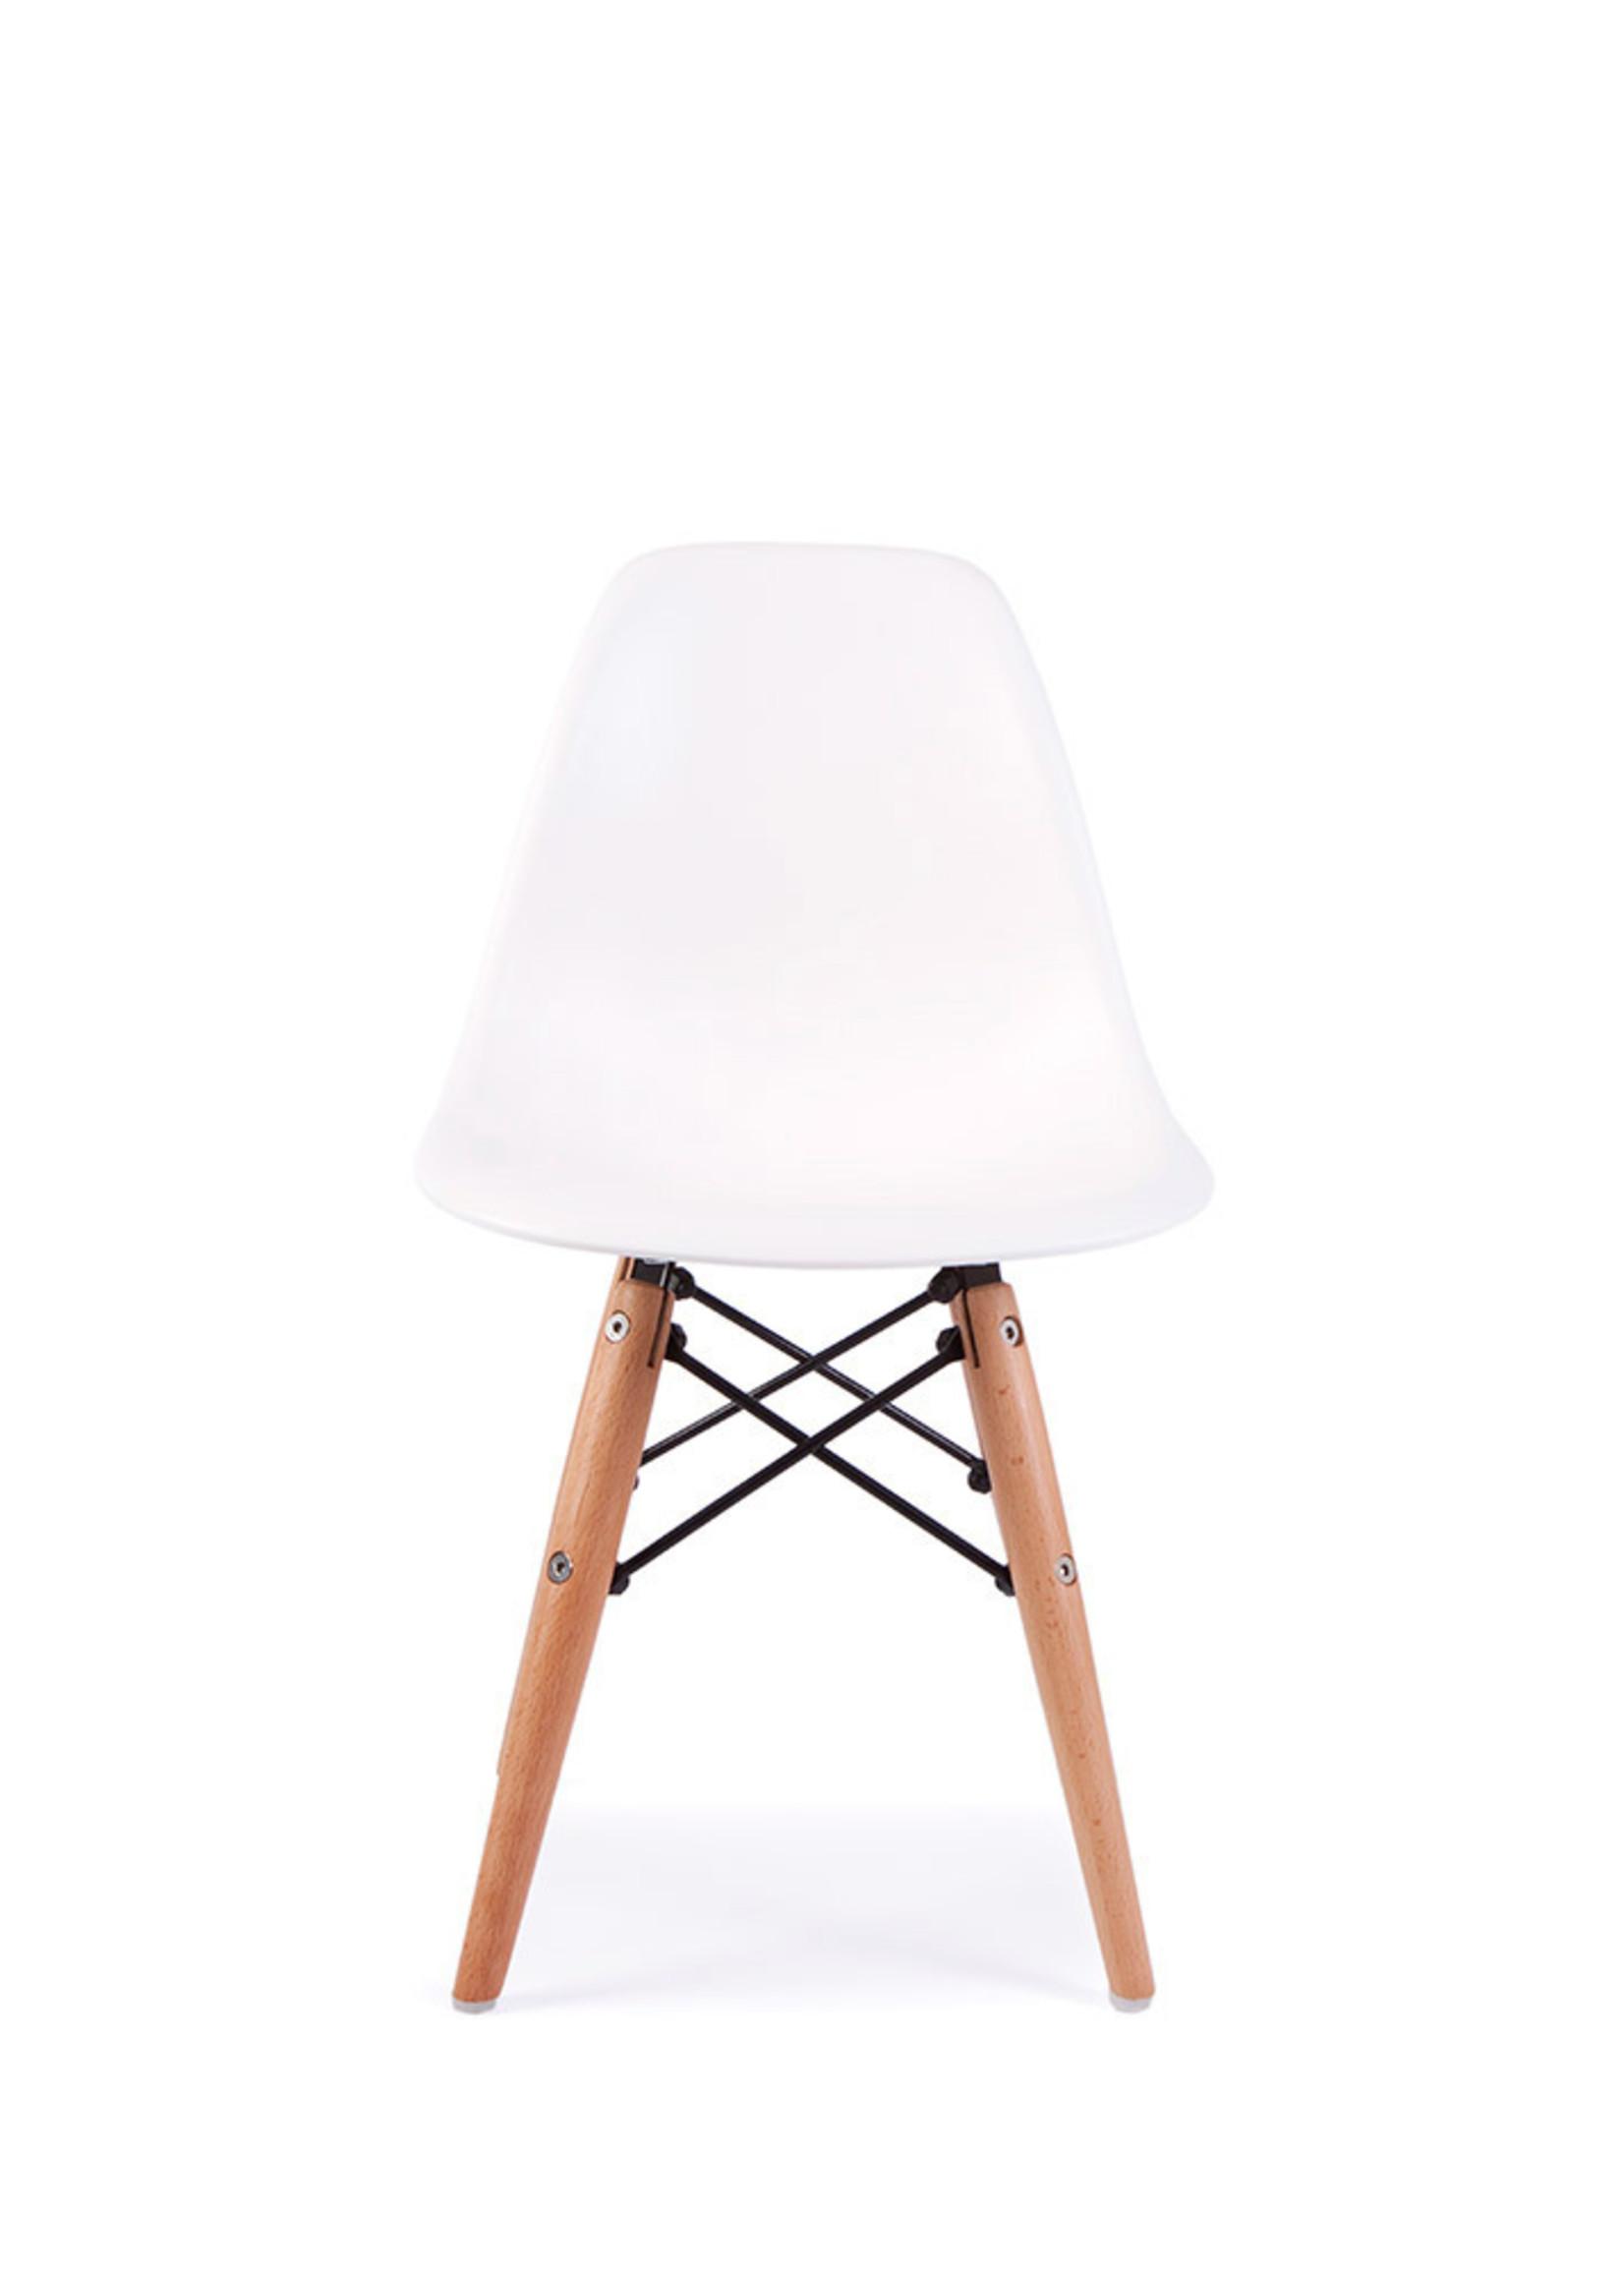 DSW Kinderstoel Eames Wit